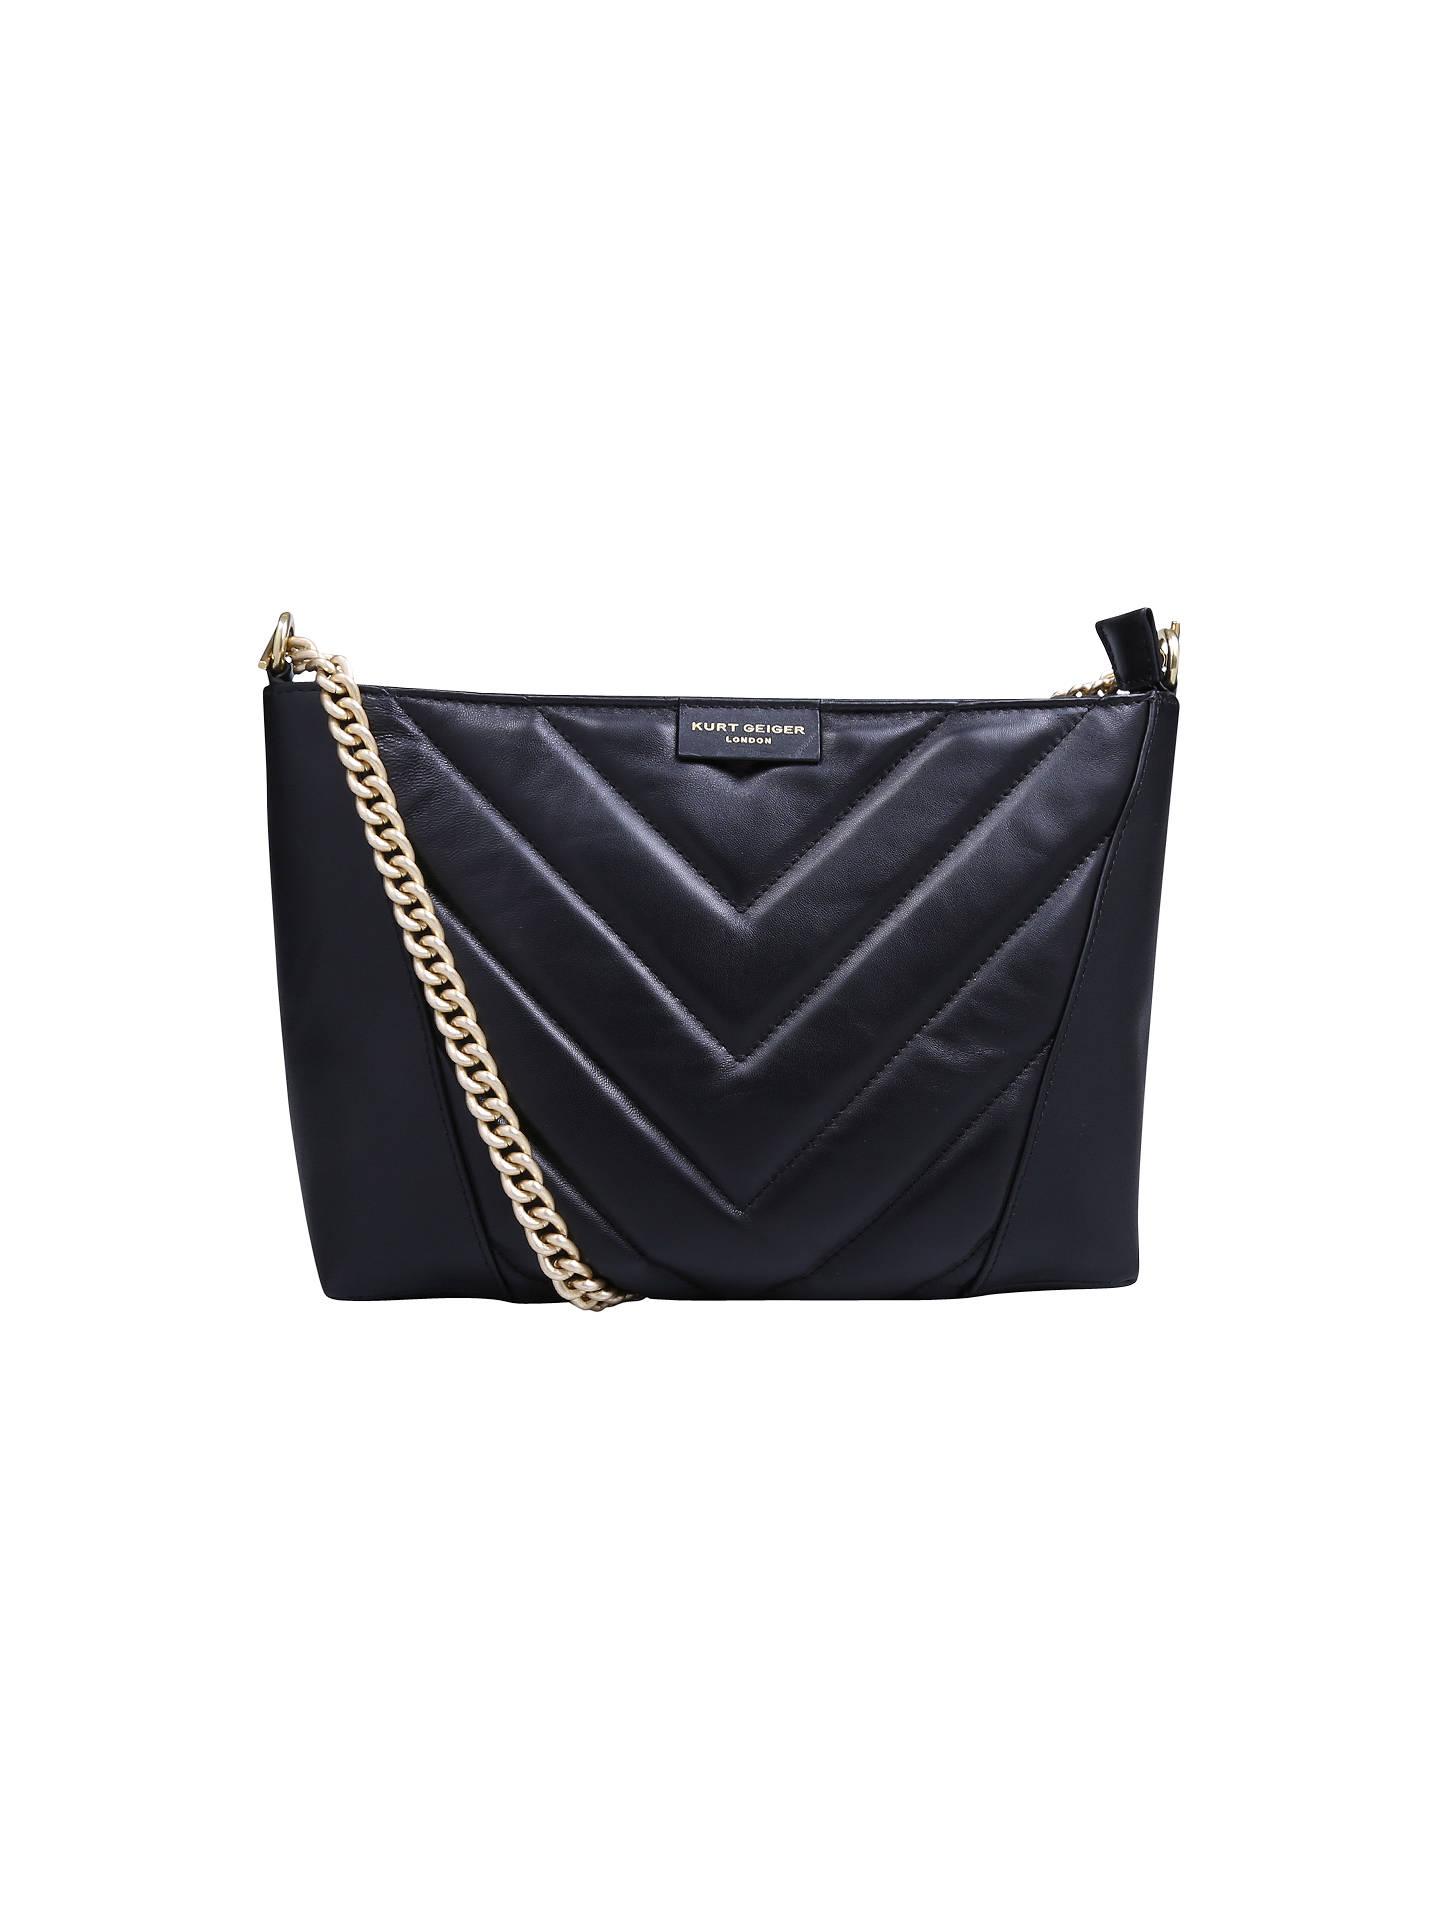 13978f44be Buy Kurt Geiger South Kensington Leather Cross Body Bag